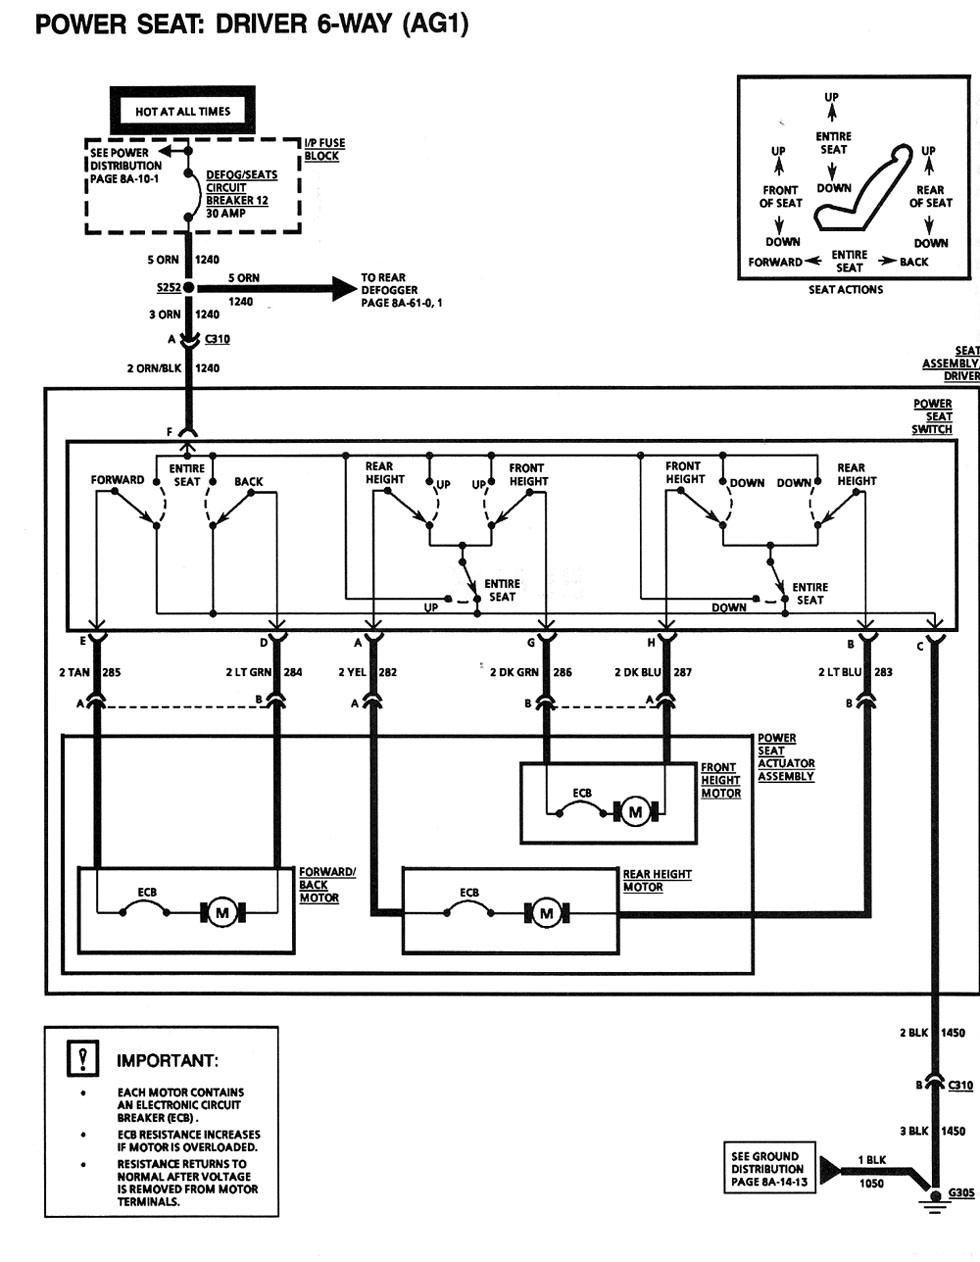 Astonishing 4Th Gen Lt1 F Body Tech Aids Wiring Cloud Hemtshollocom